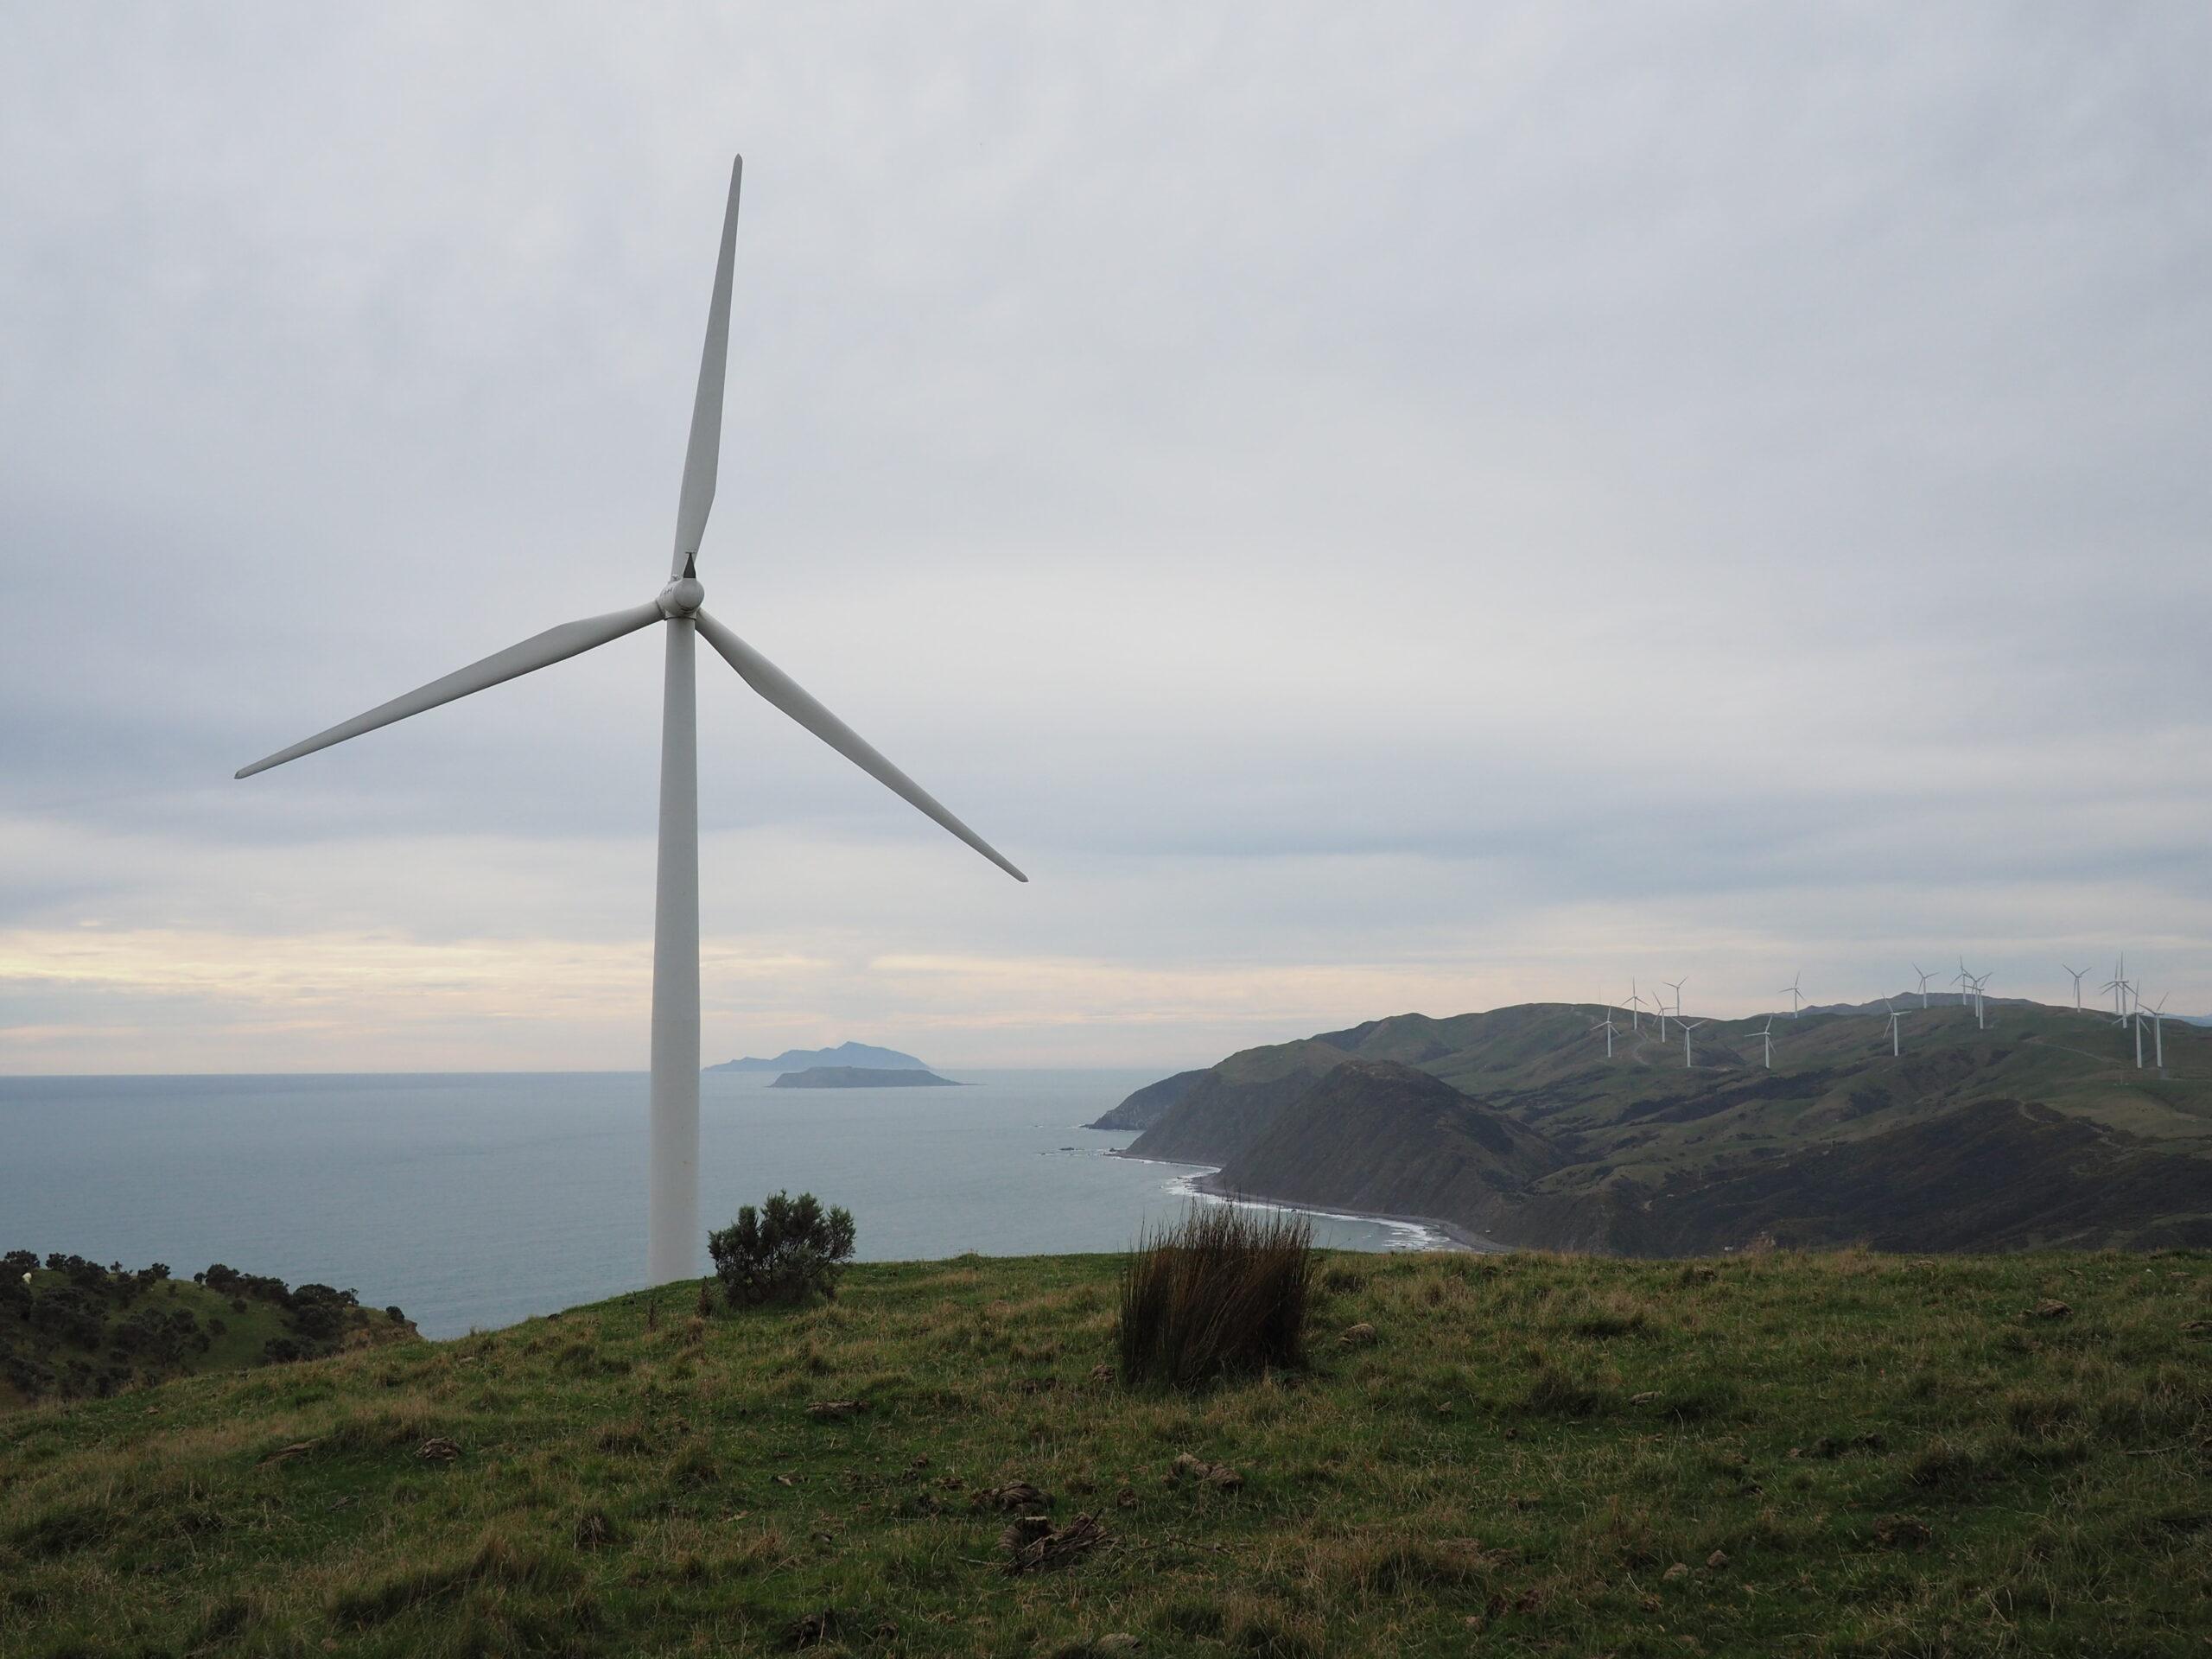 West Wind Farm